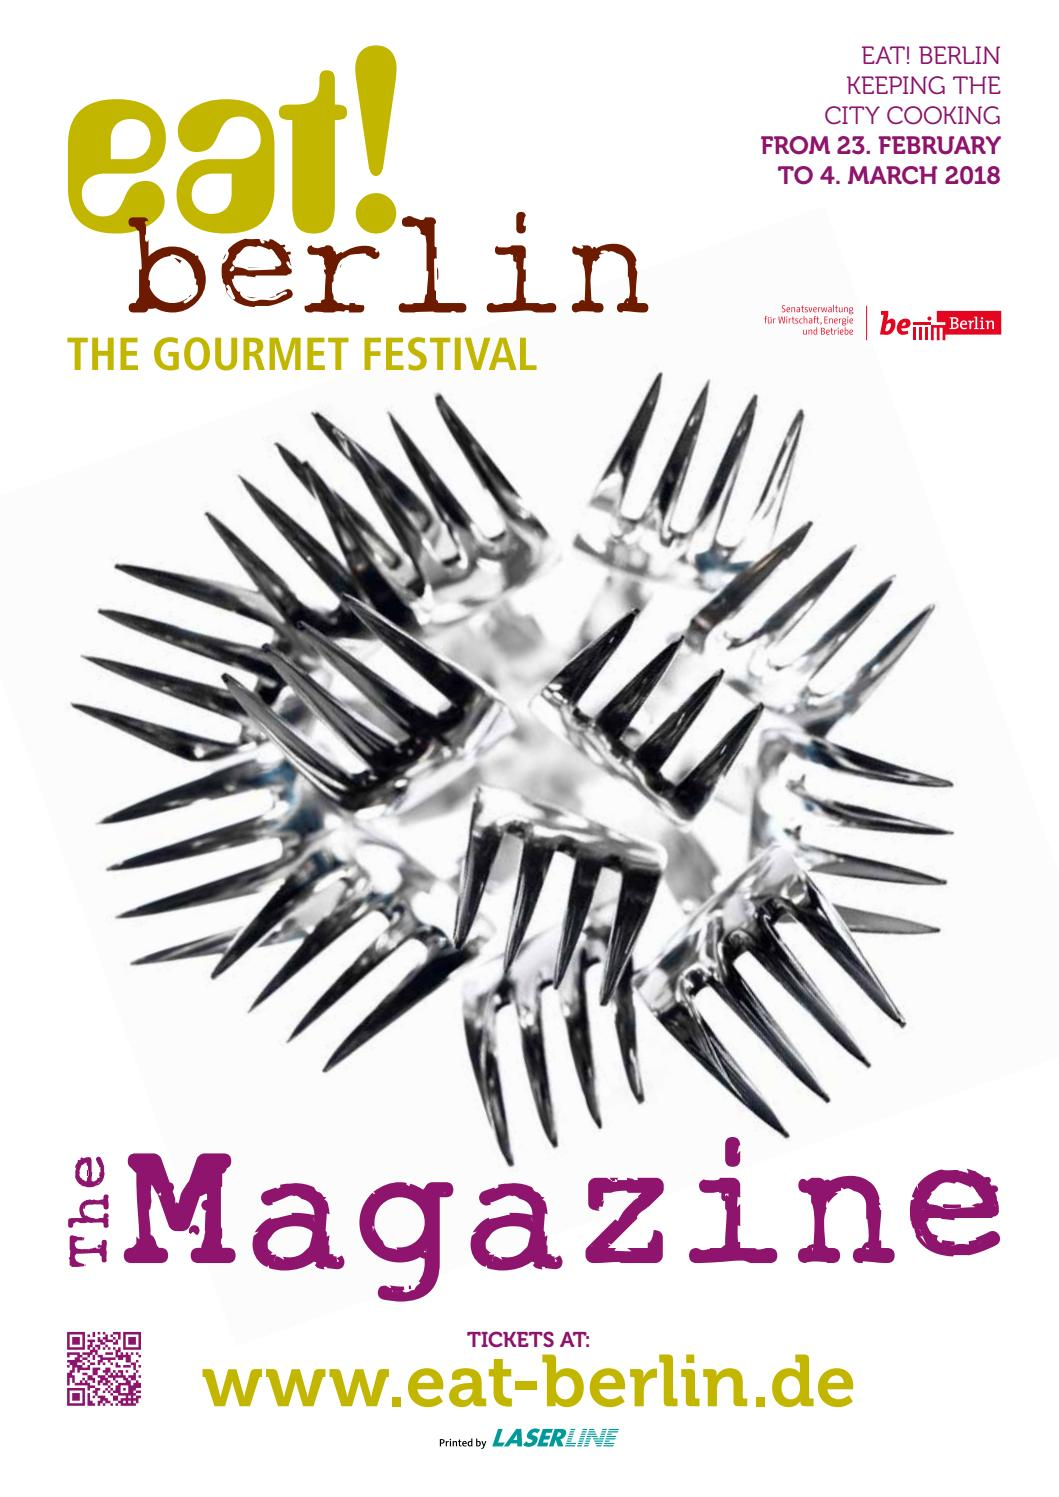 f1b6a9f5e52 eat! berlin the gourmet festival – the magazin 2018 by mattheis  werbeagentur gmbh - issuu